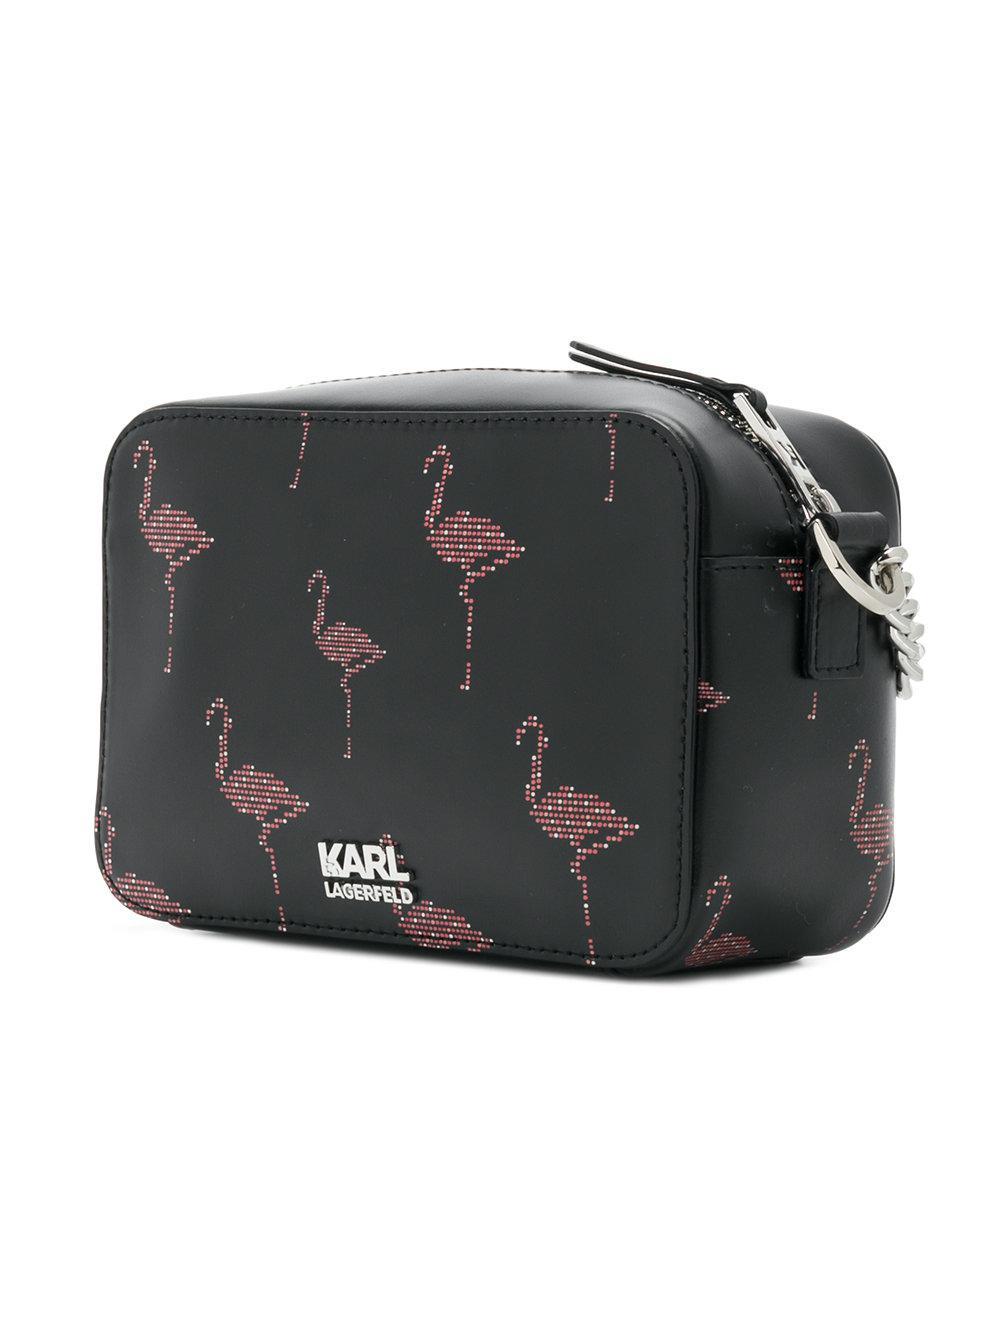 Karl Lagerfeld Leather Flamingo Print Crossbody Bag in Black